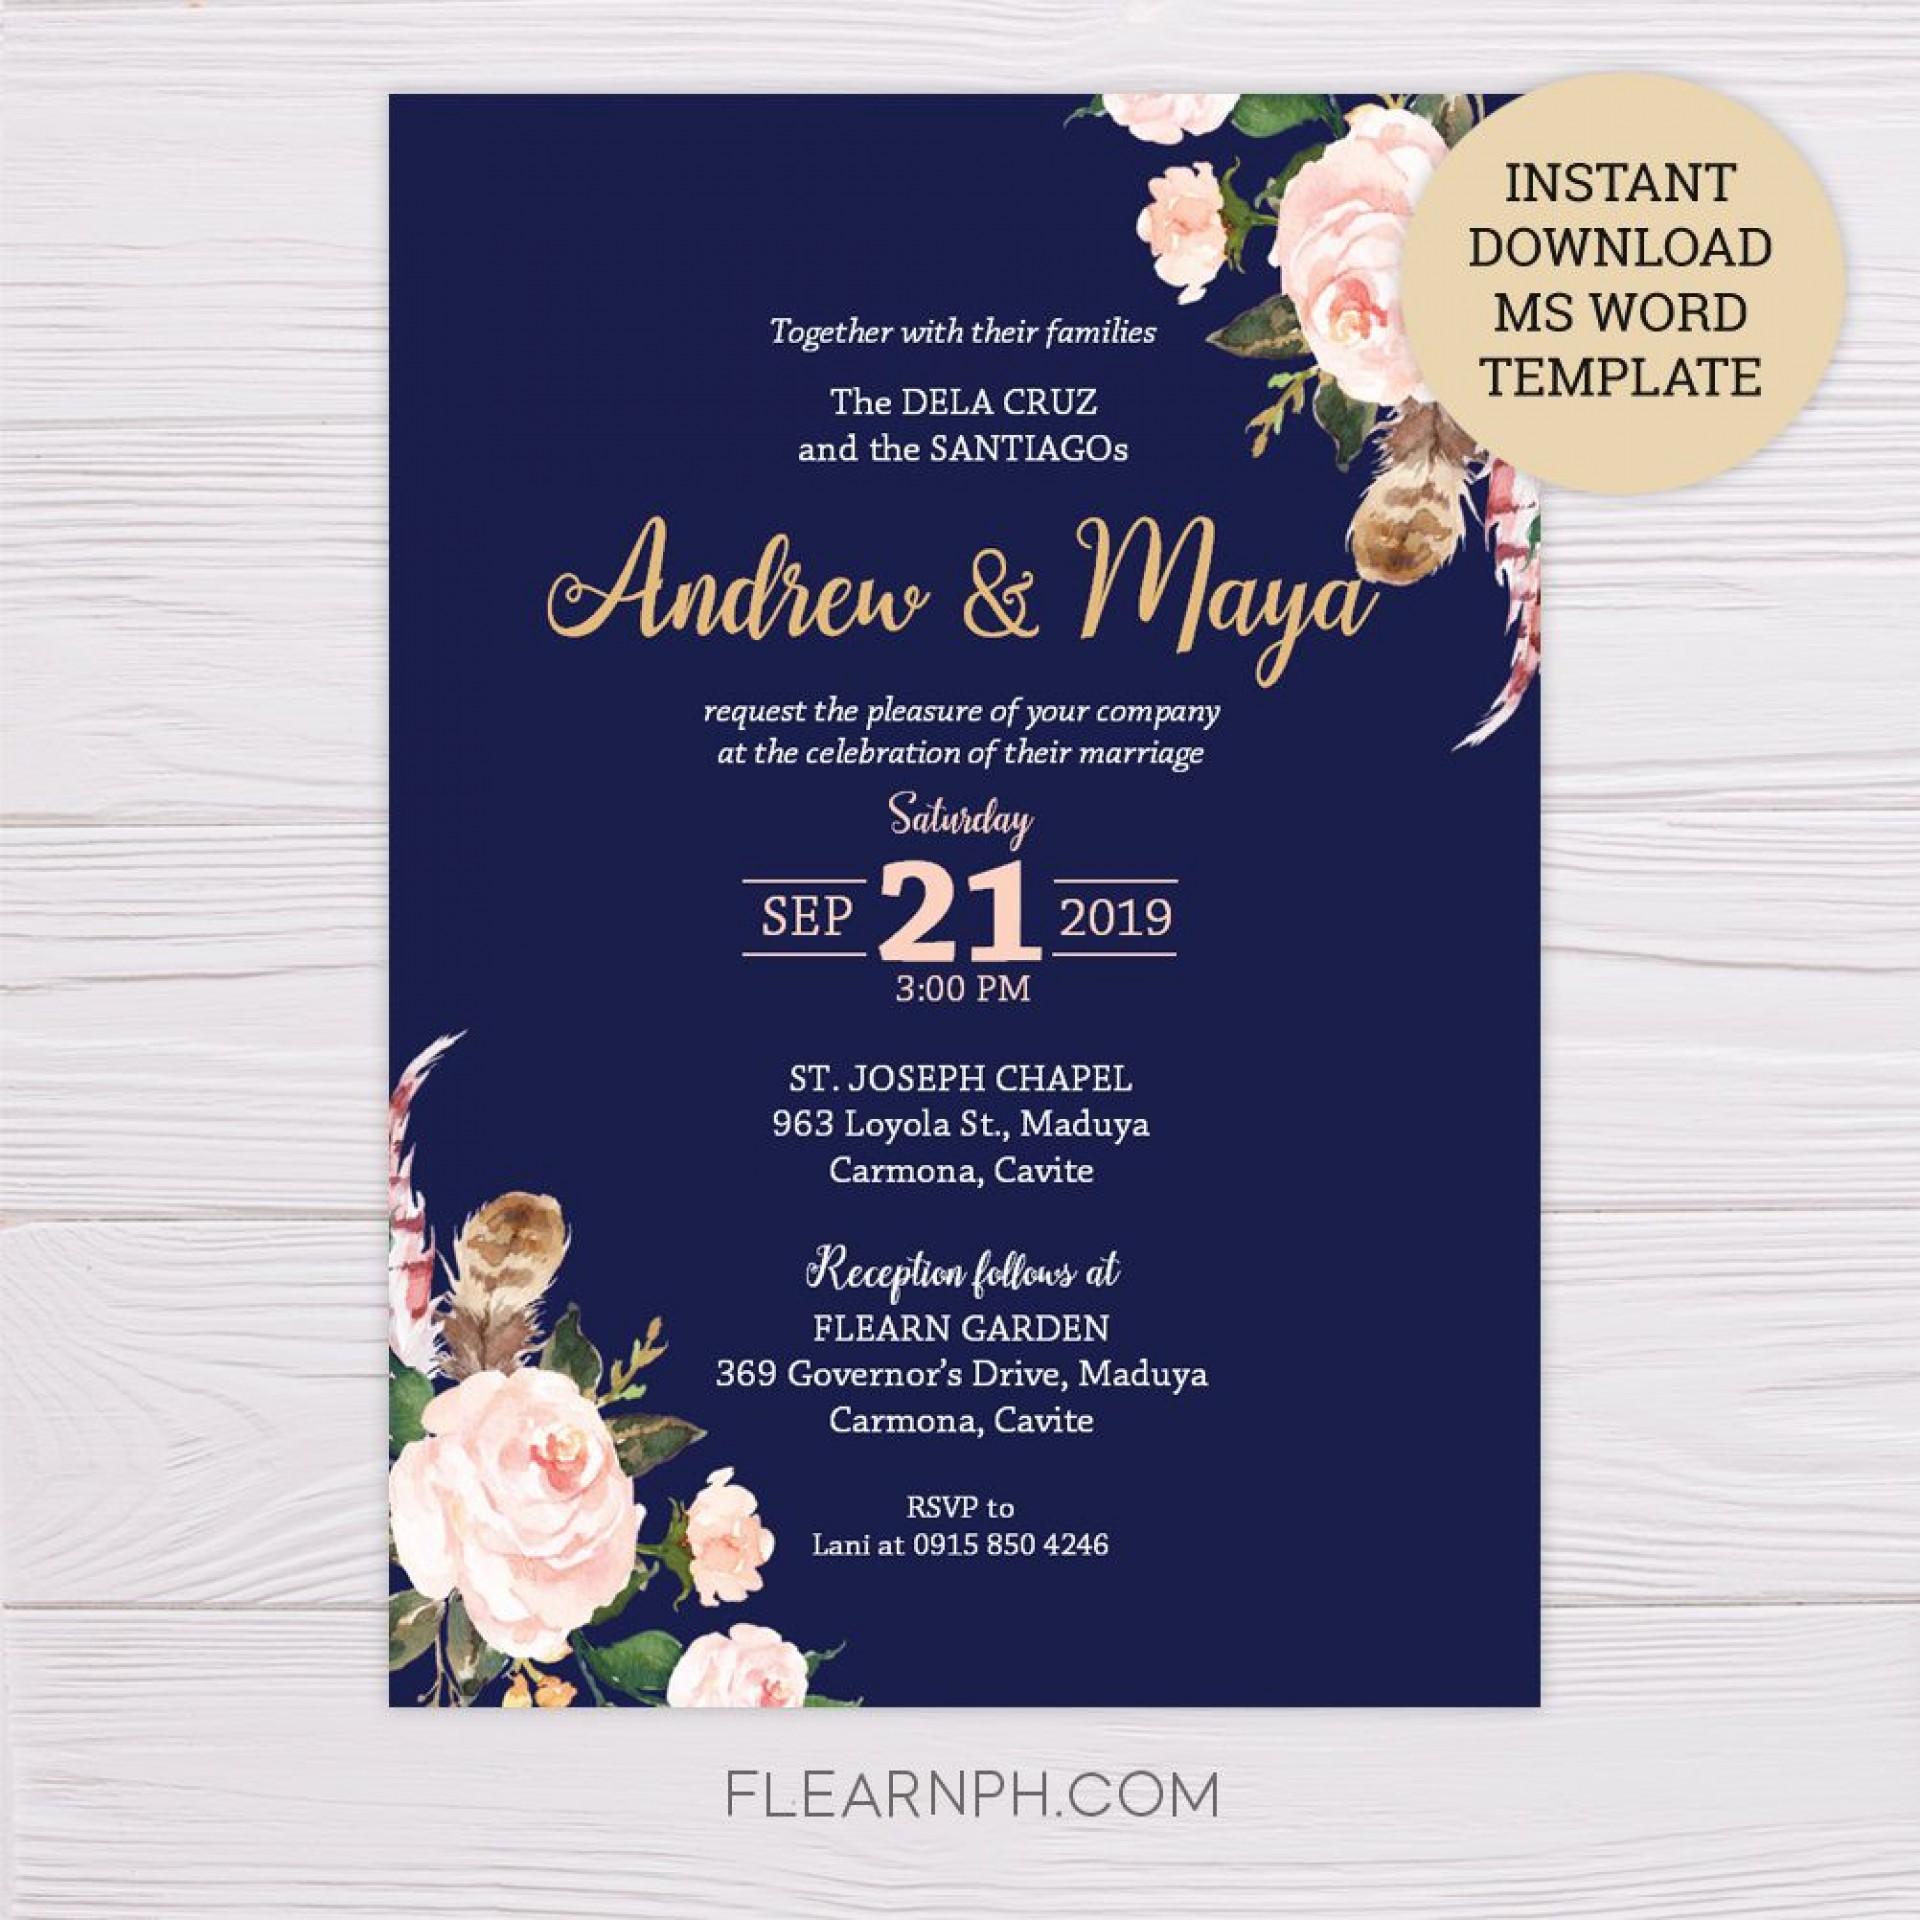 008 Remarkable Microsoft Word Wedding Invitation Template Free Download Idea  M Editable1920